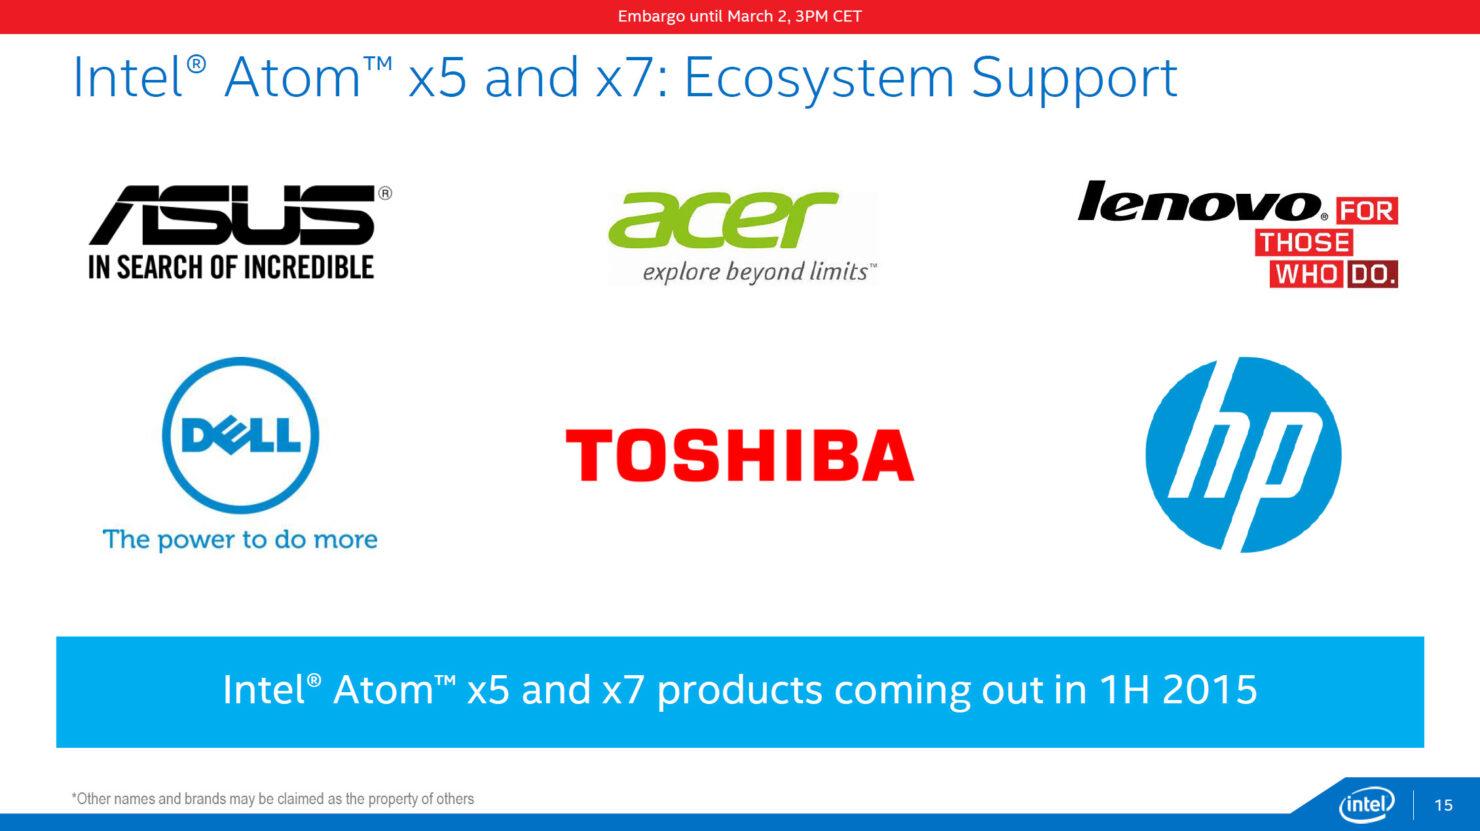 intel-cherry-trail_atom-x7-and-atom-x5-ecosystem-support